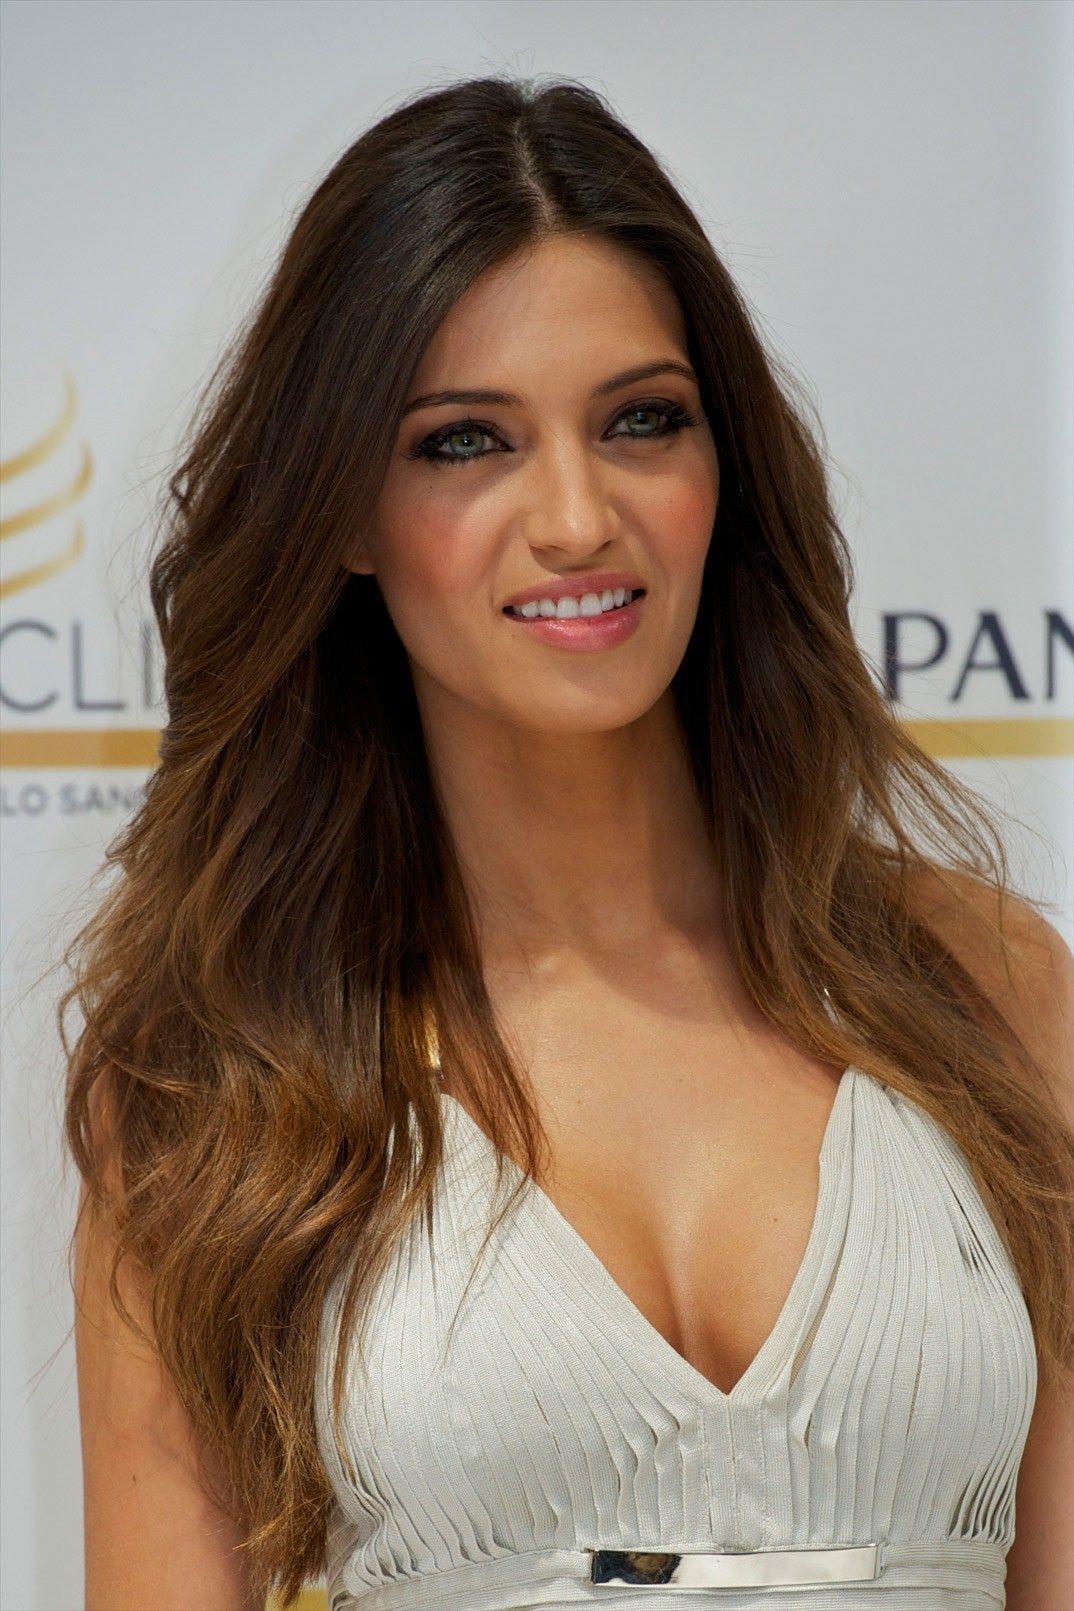 Paparazzi Nataly Garcia nudes (12 foto and video), Tits, Paparazzi, Twitter, in bikini 2020